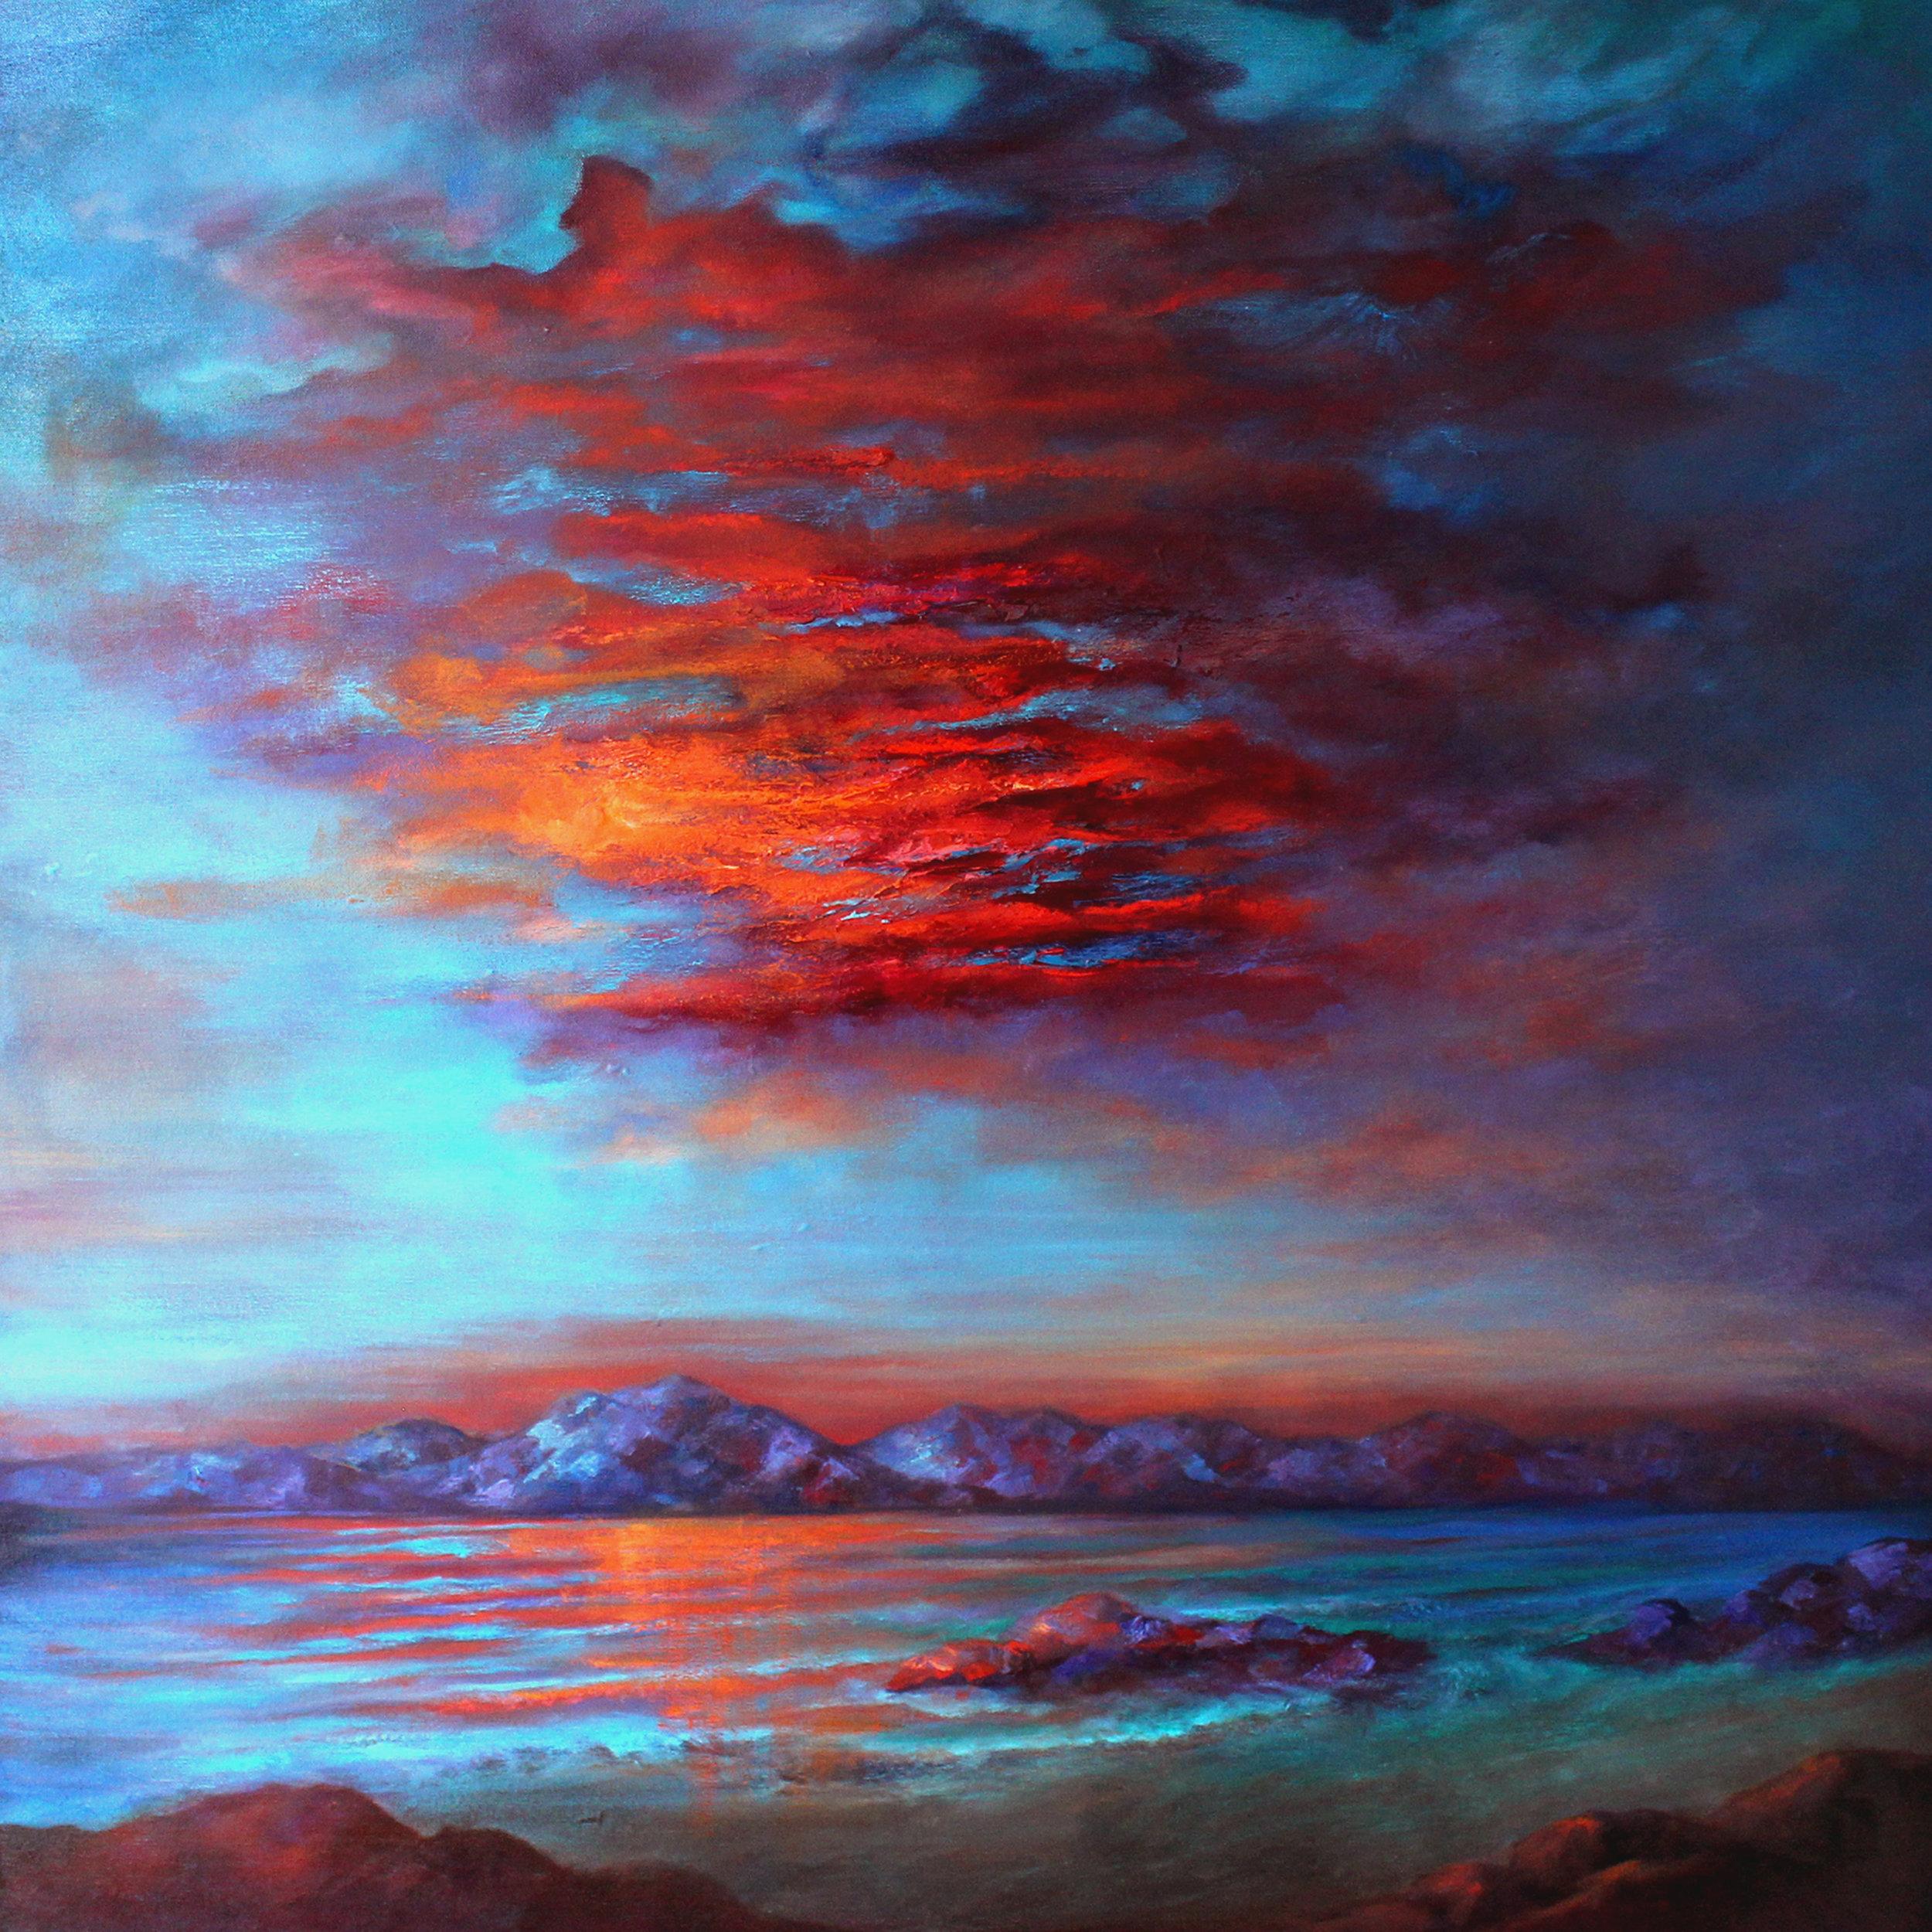 """FLASH OF INSIGHT""  Original Oil on Canvas, 36 x 36 x 2.5""d, $3,500"